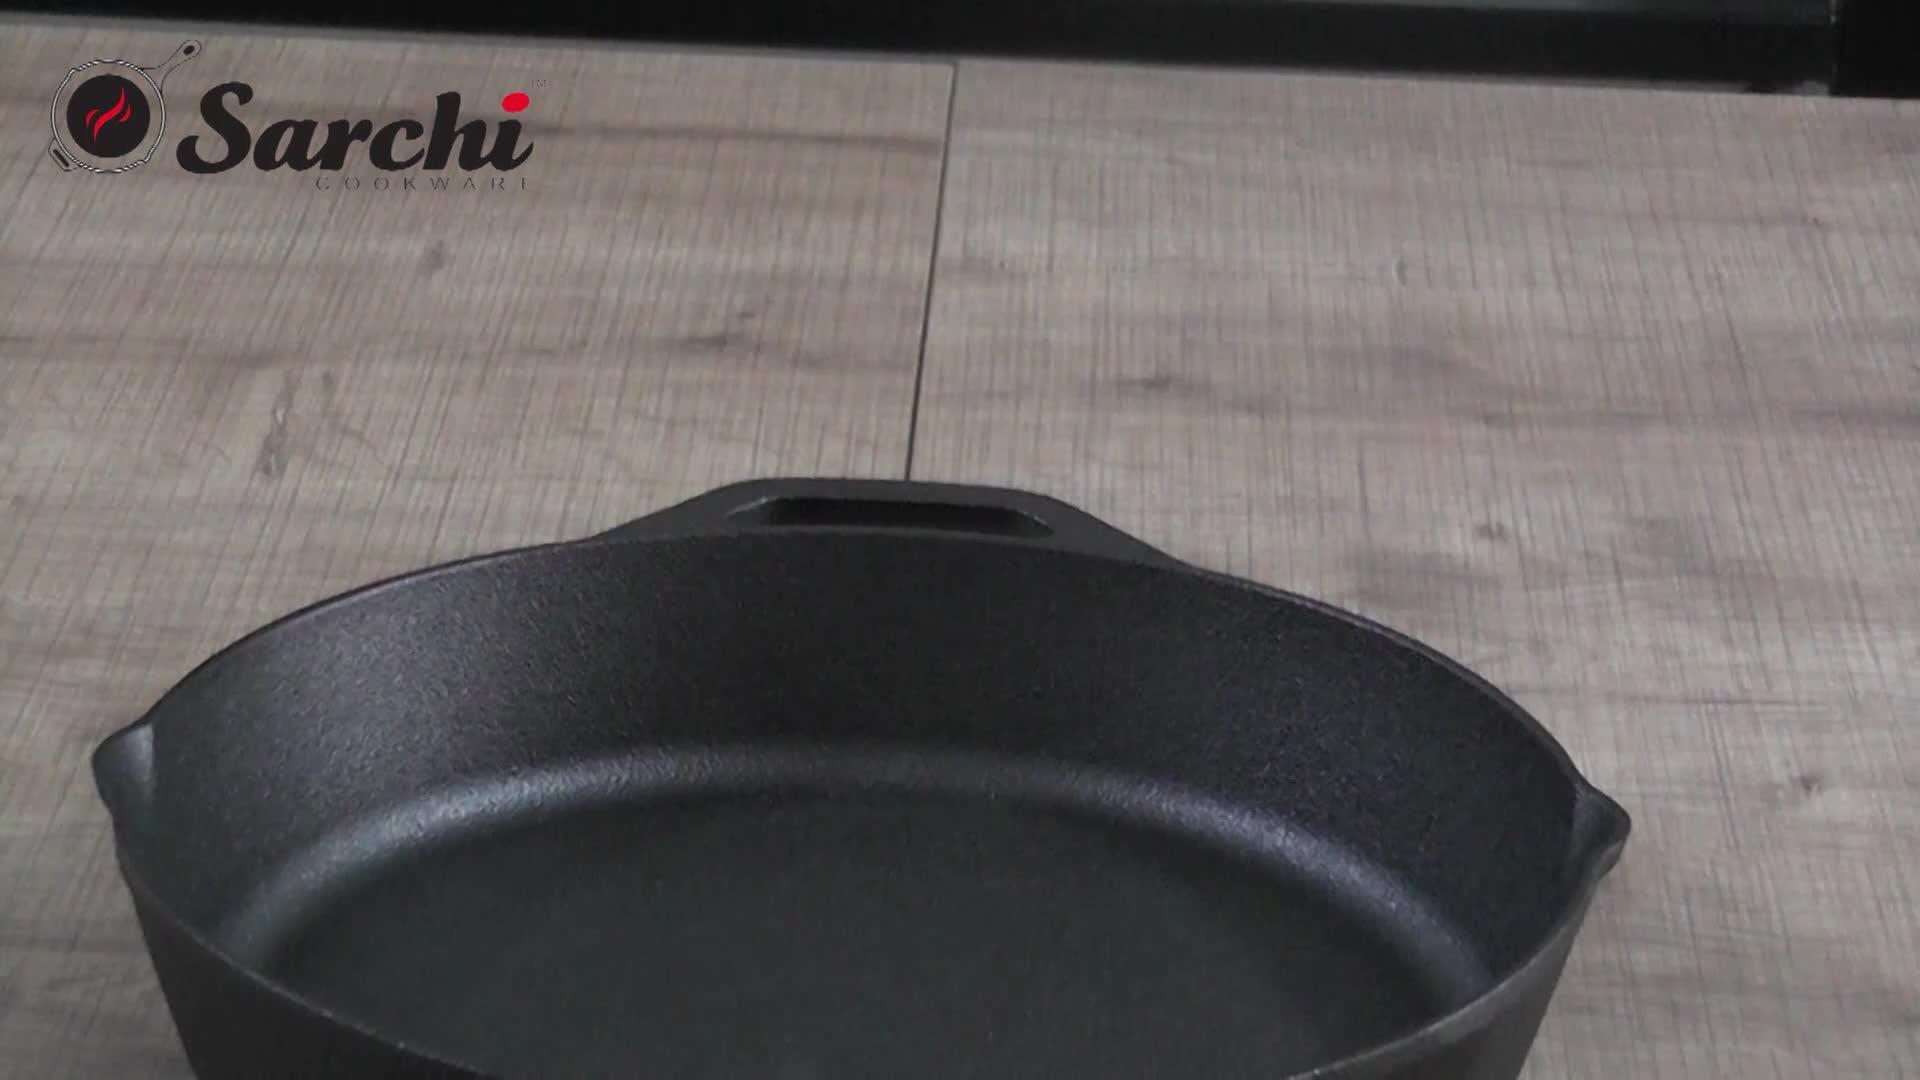 Pre-seasoned cheap custom round cookware frying pan cast iron skillet